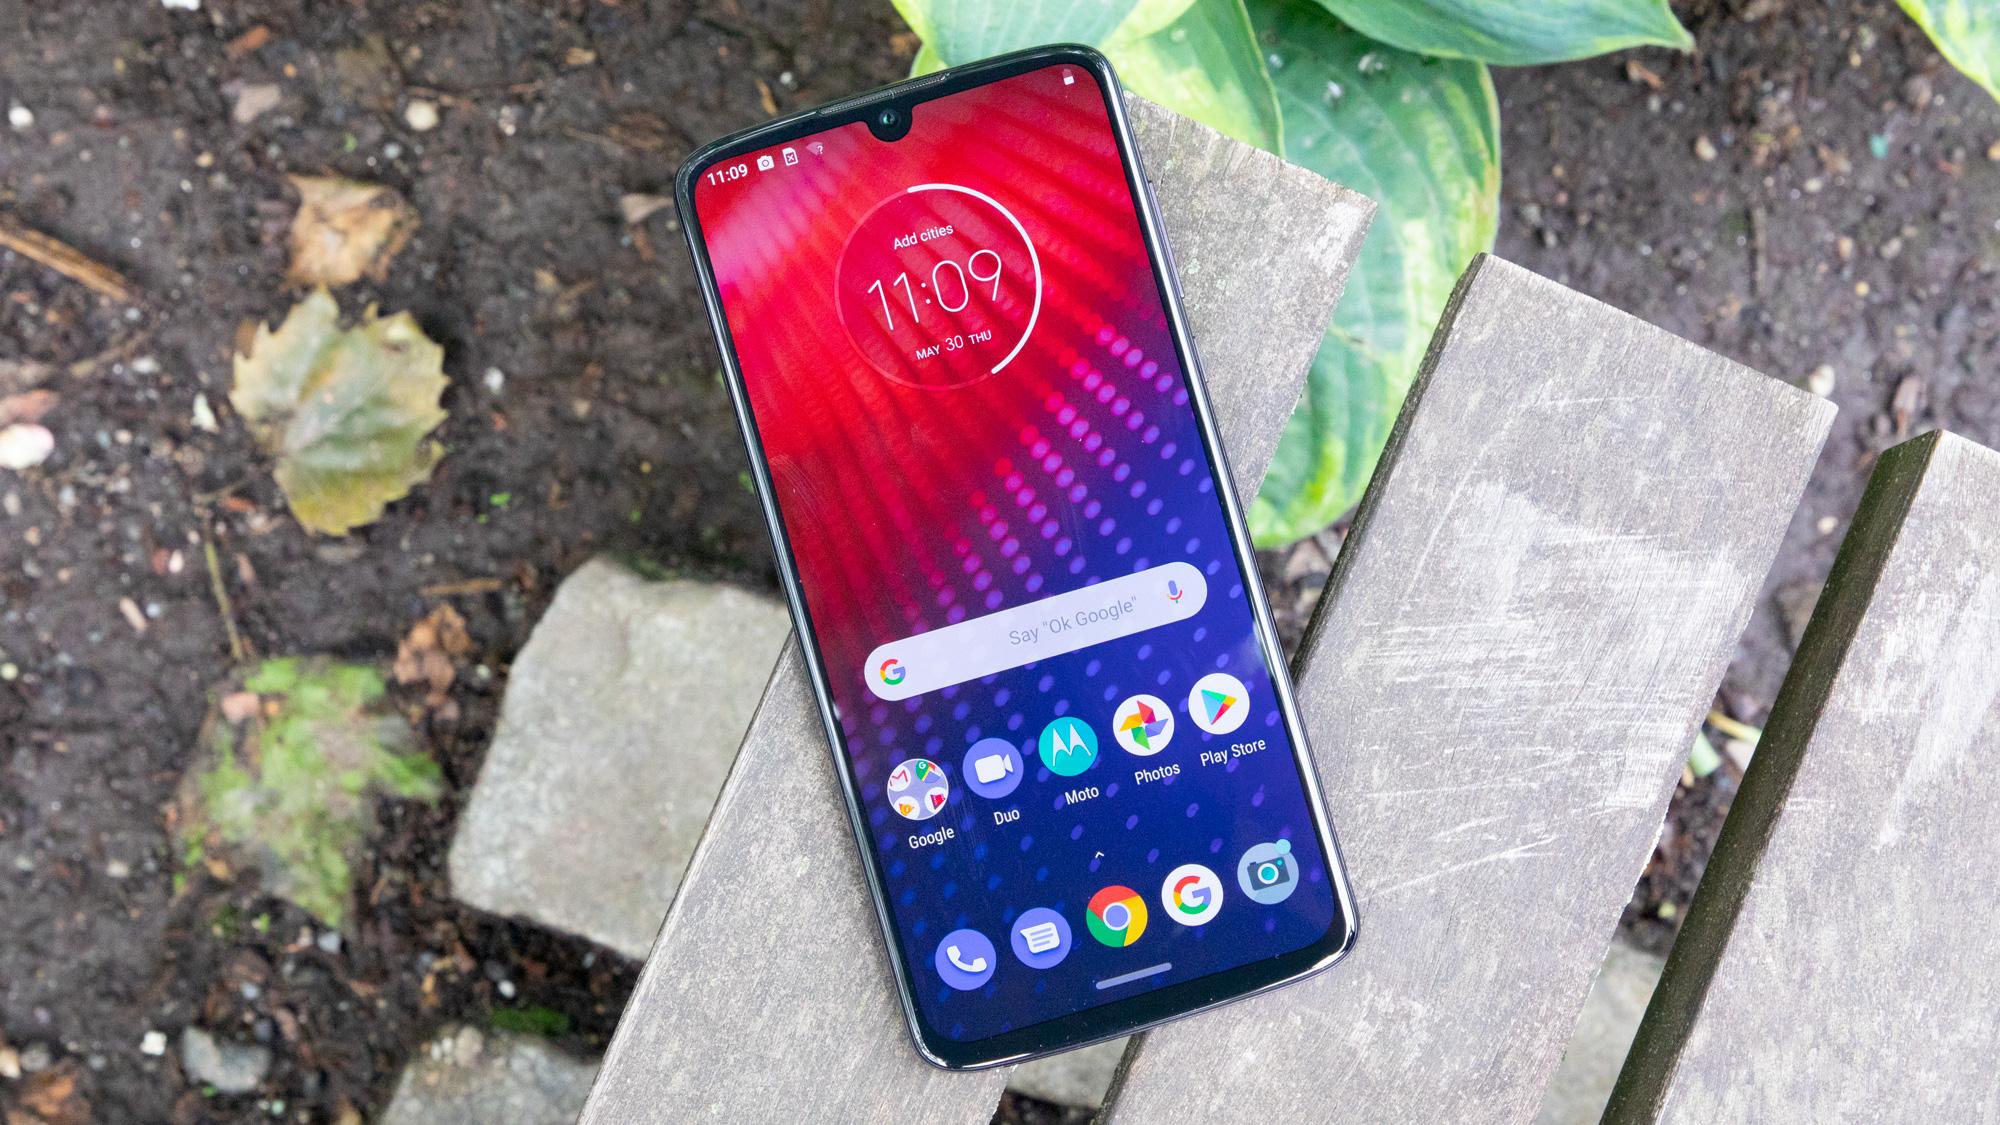 Motorola Edge Plus release date, price, news and leaks